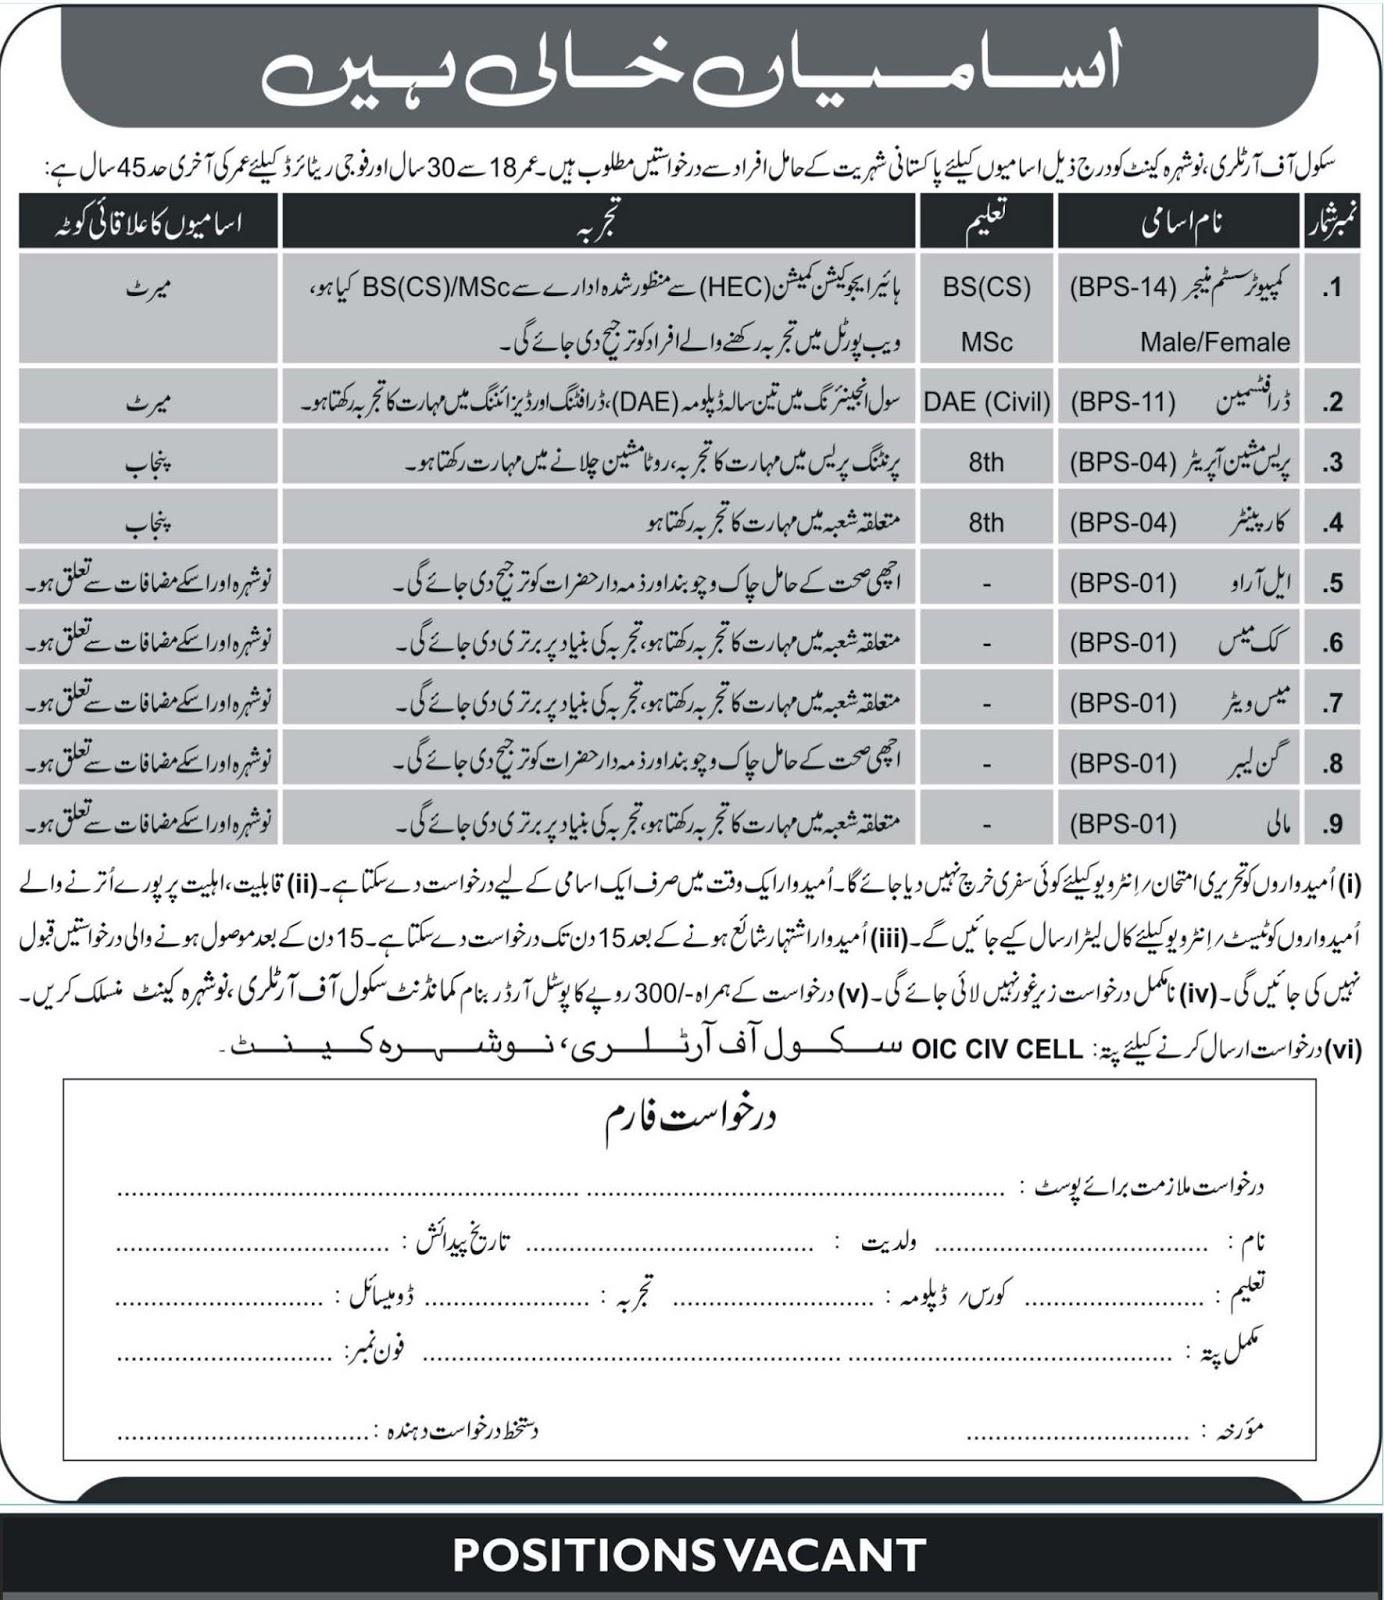 School of Artillery Nowshera Cantt Jobs for All Pakistan